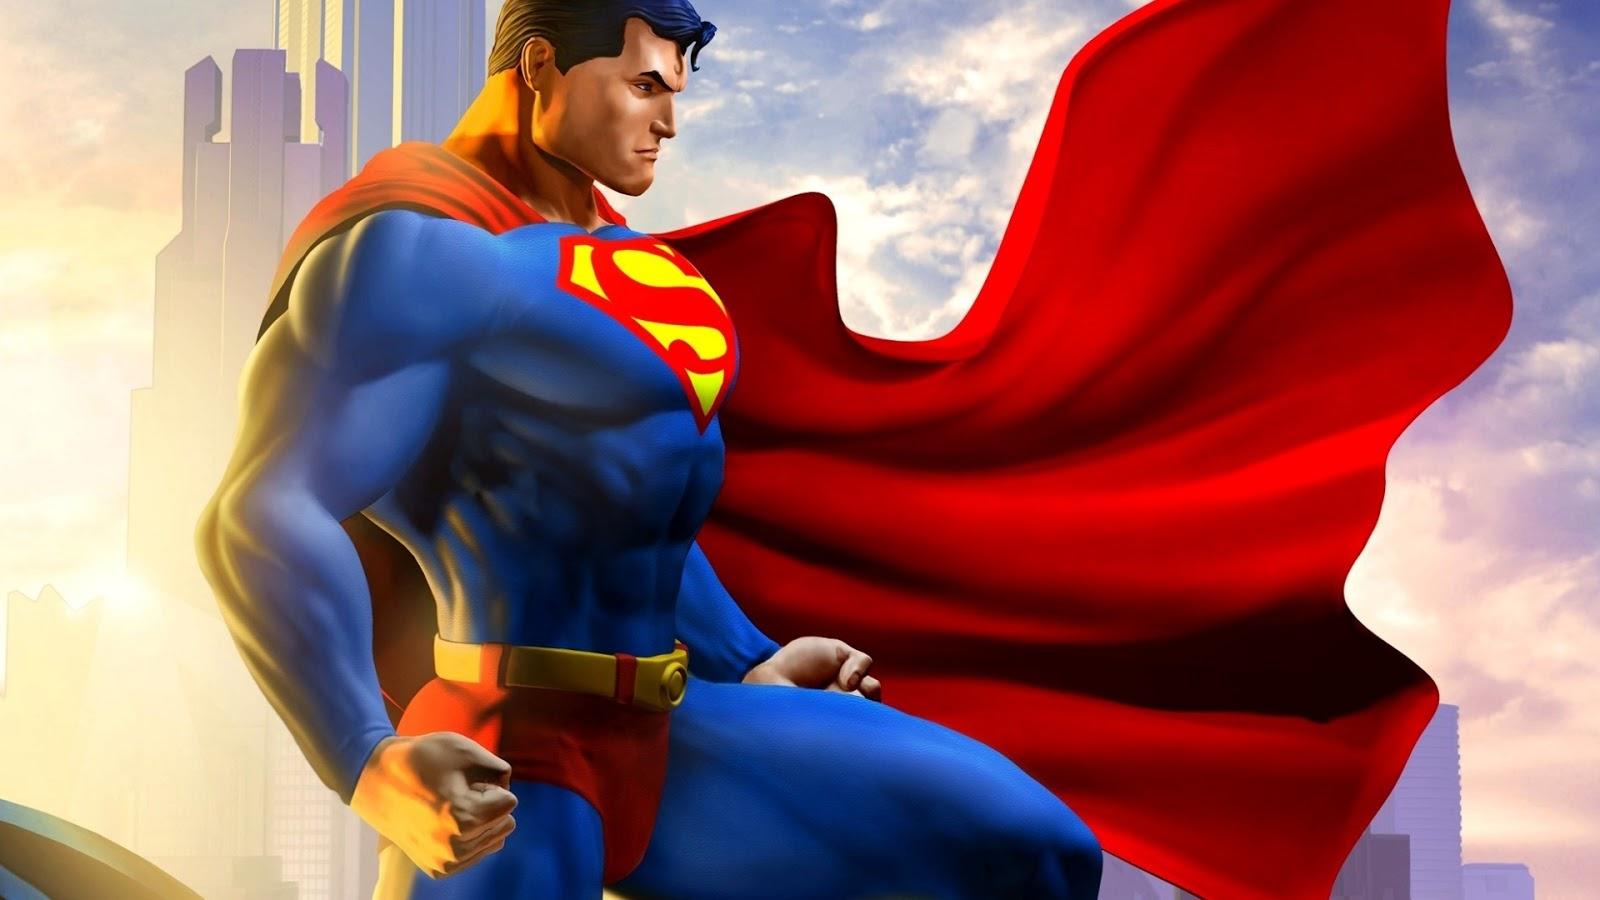 superman game pc free download full version